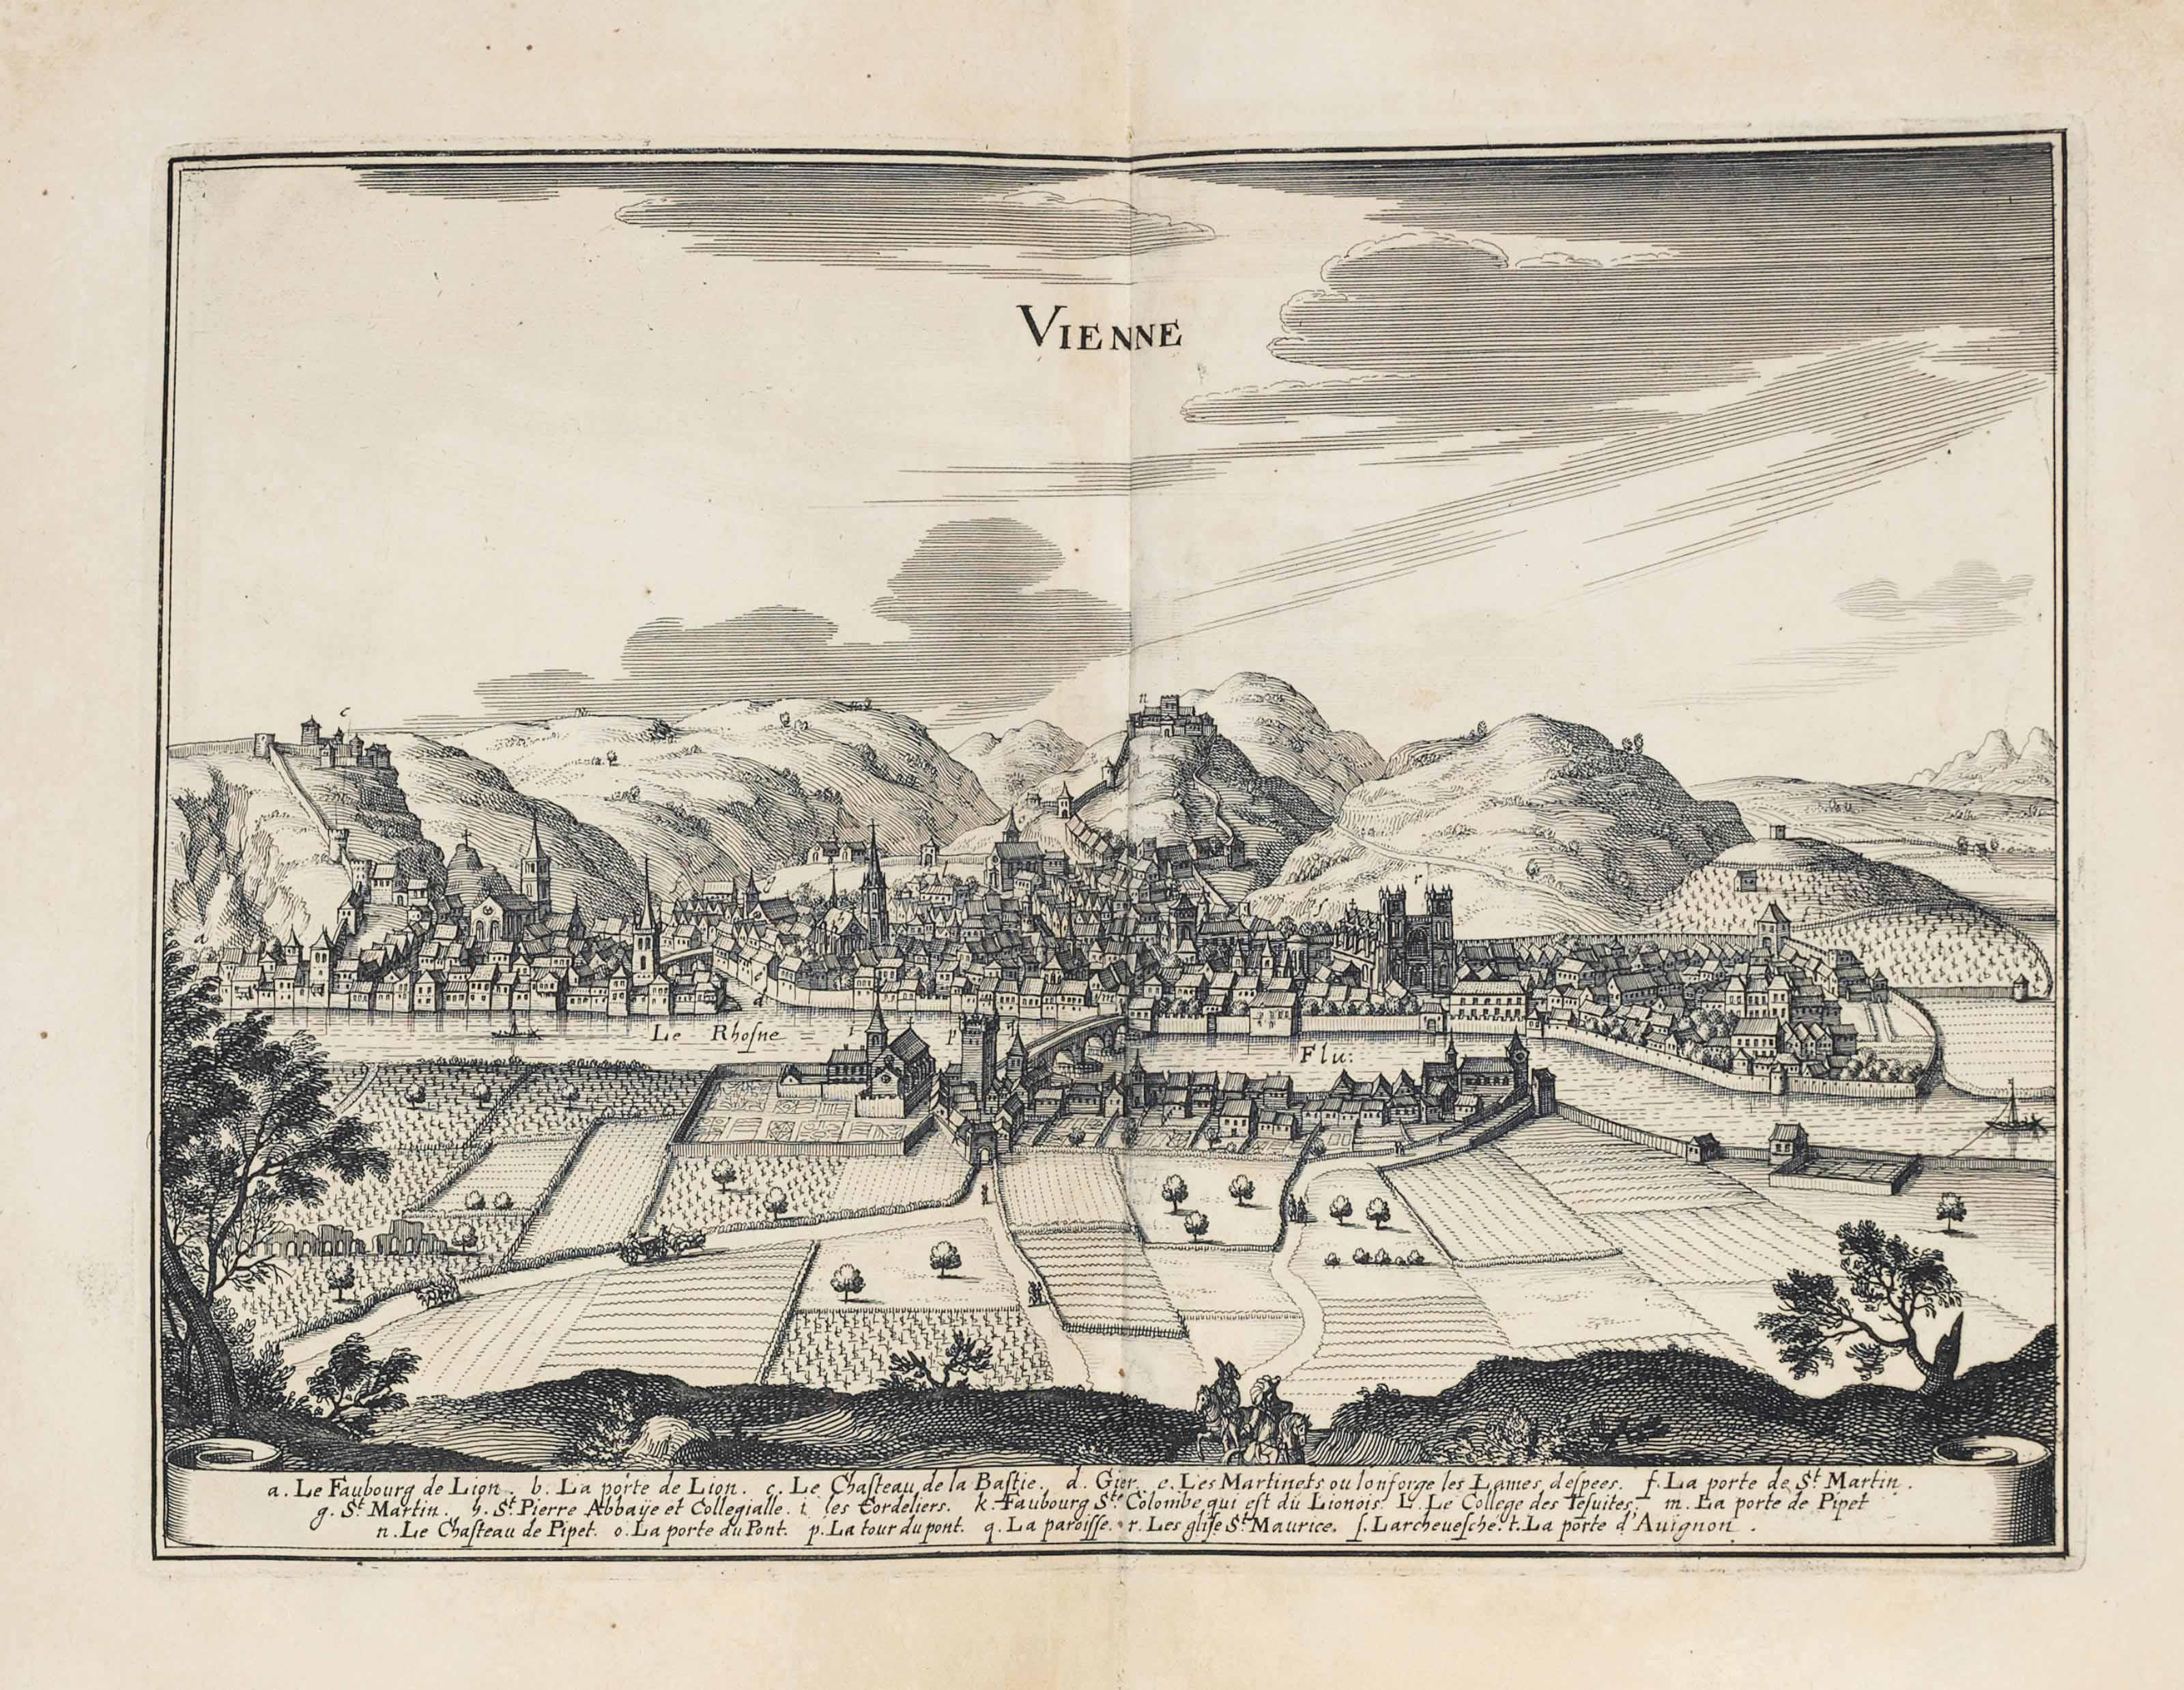 MATTHEUS MERIAN (1593-1650) and MARTIN ZEILER (1589-1661)